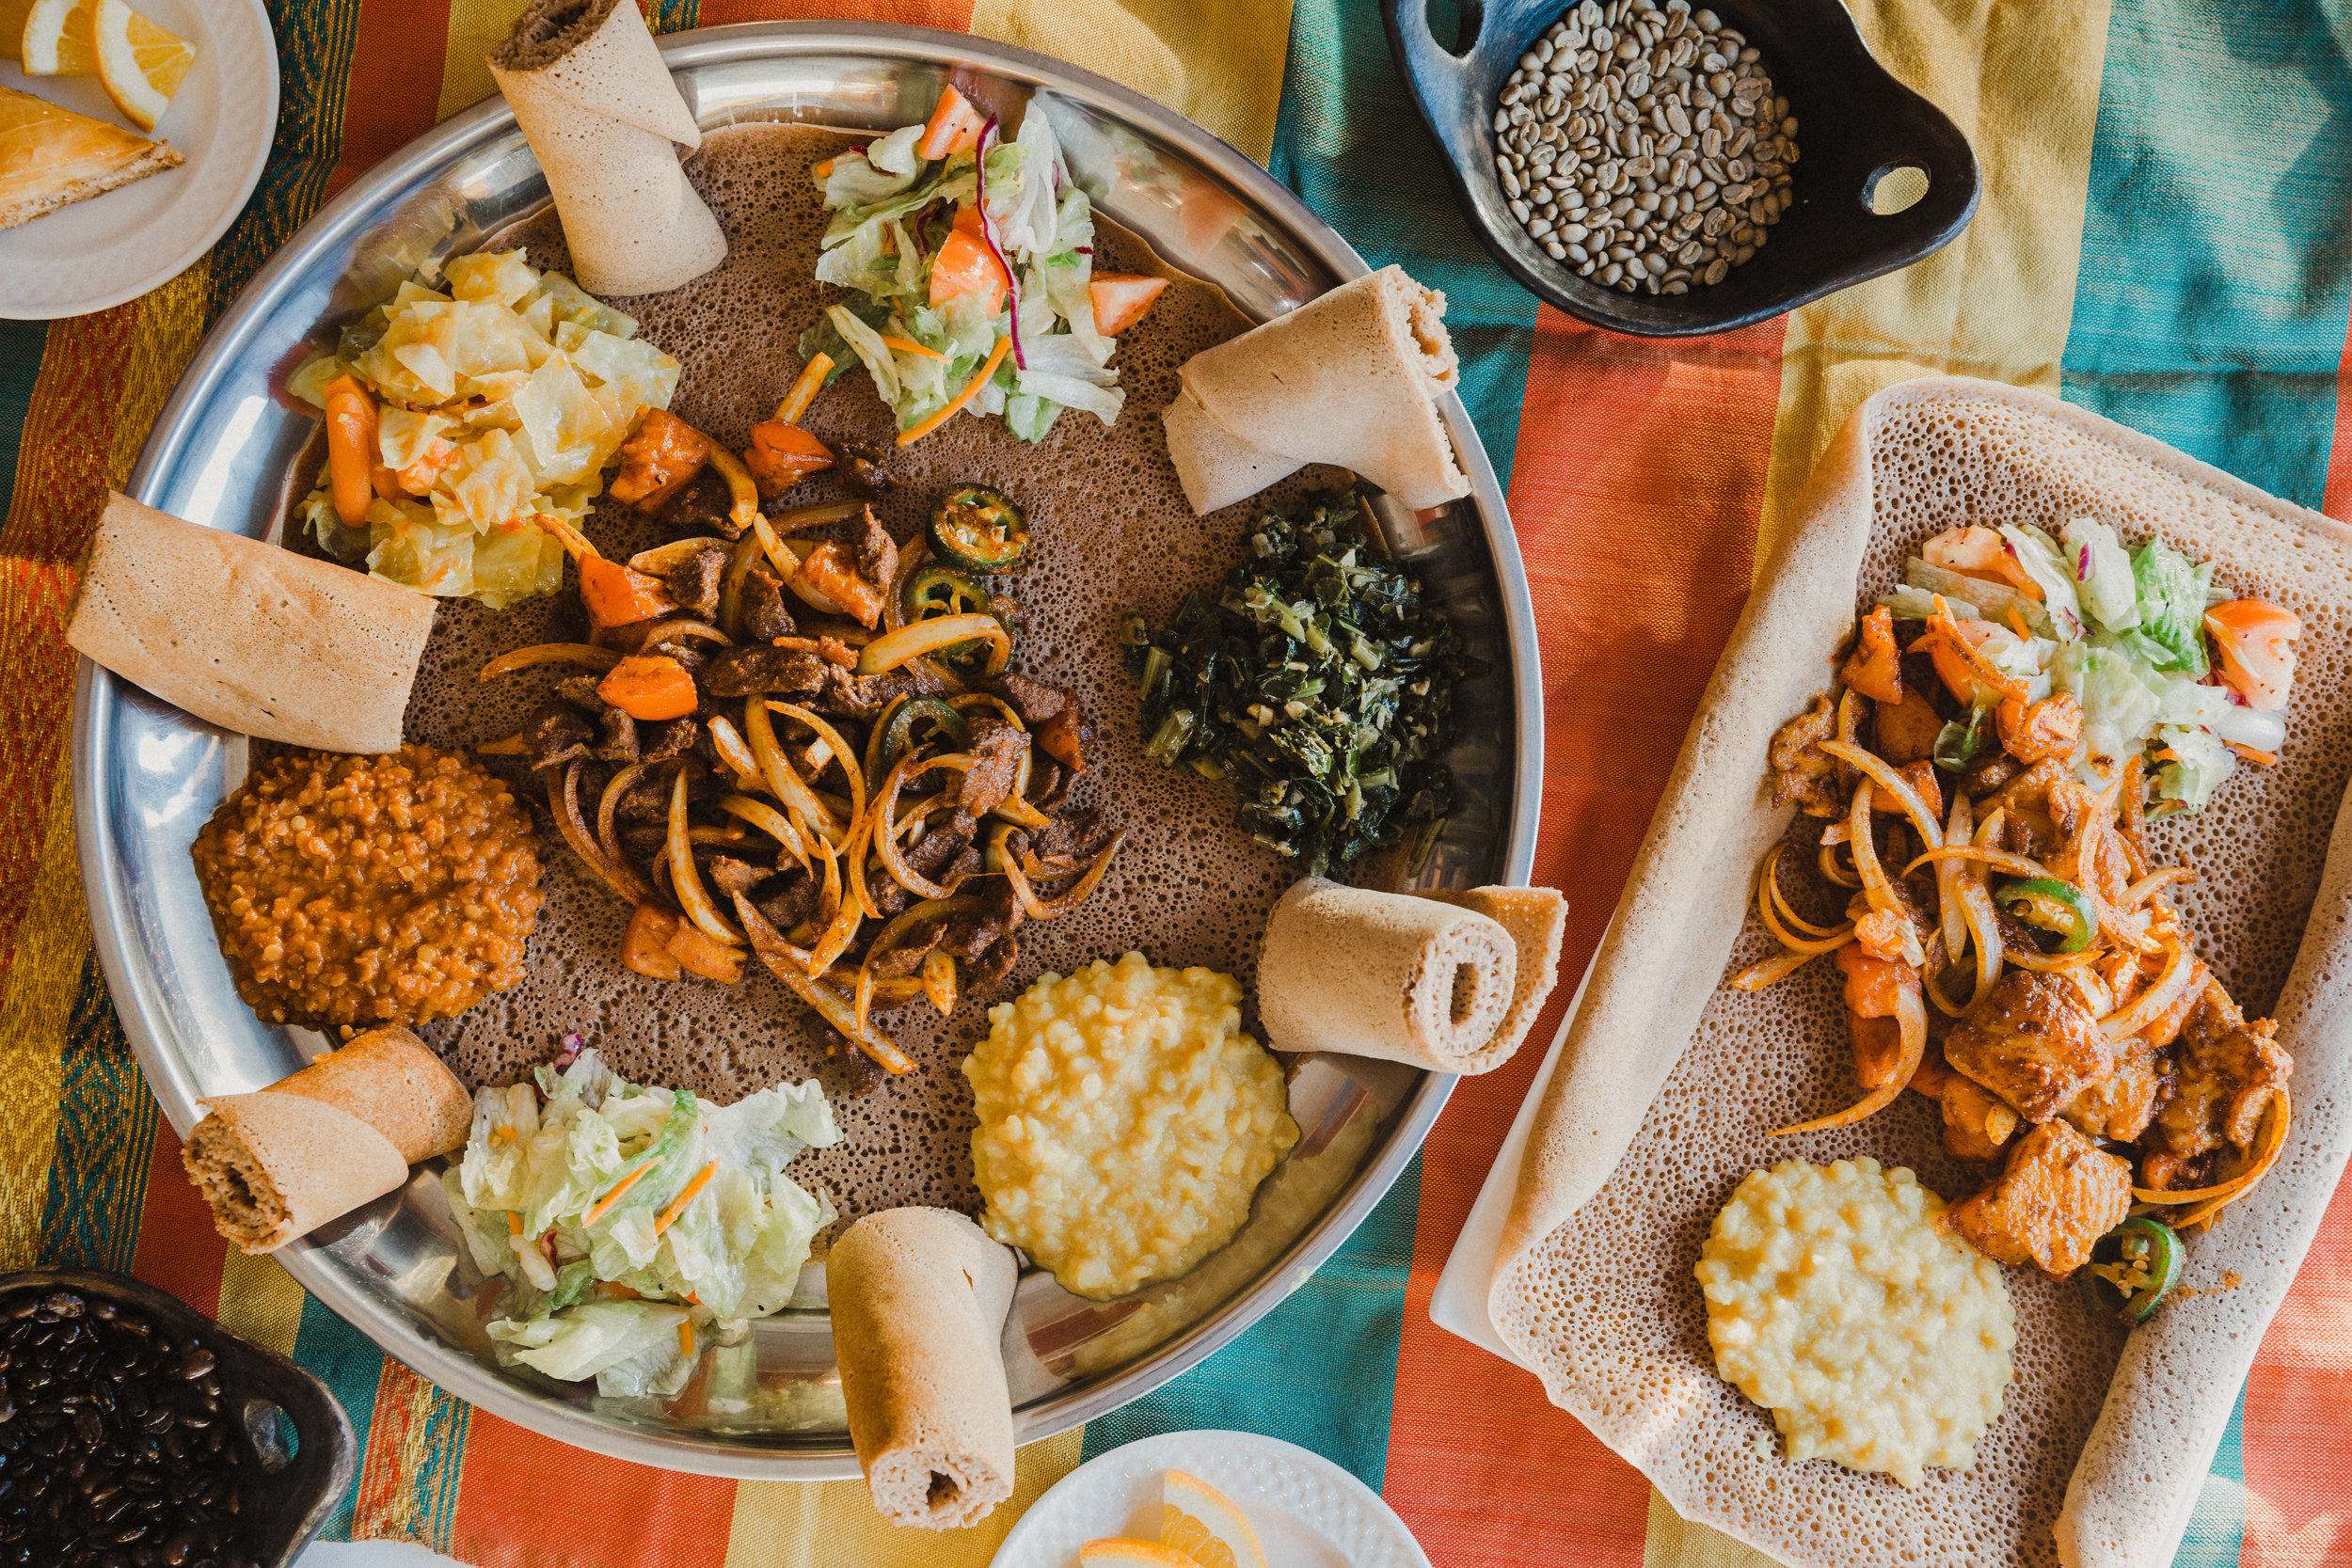 Beef and fish tibs from Desta's Ethiopian Cuisine.